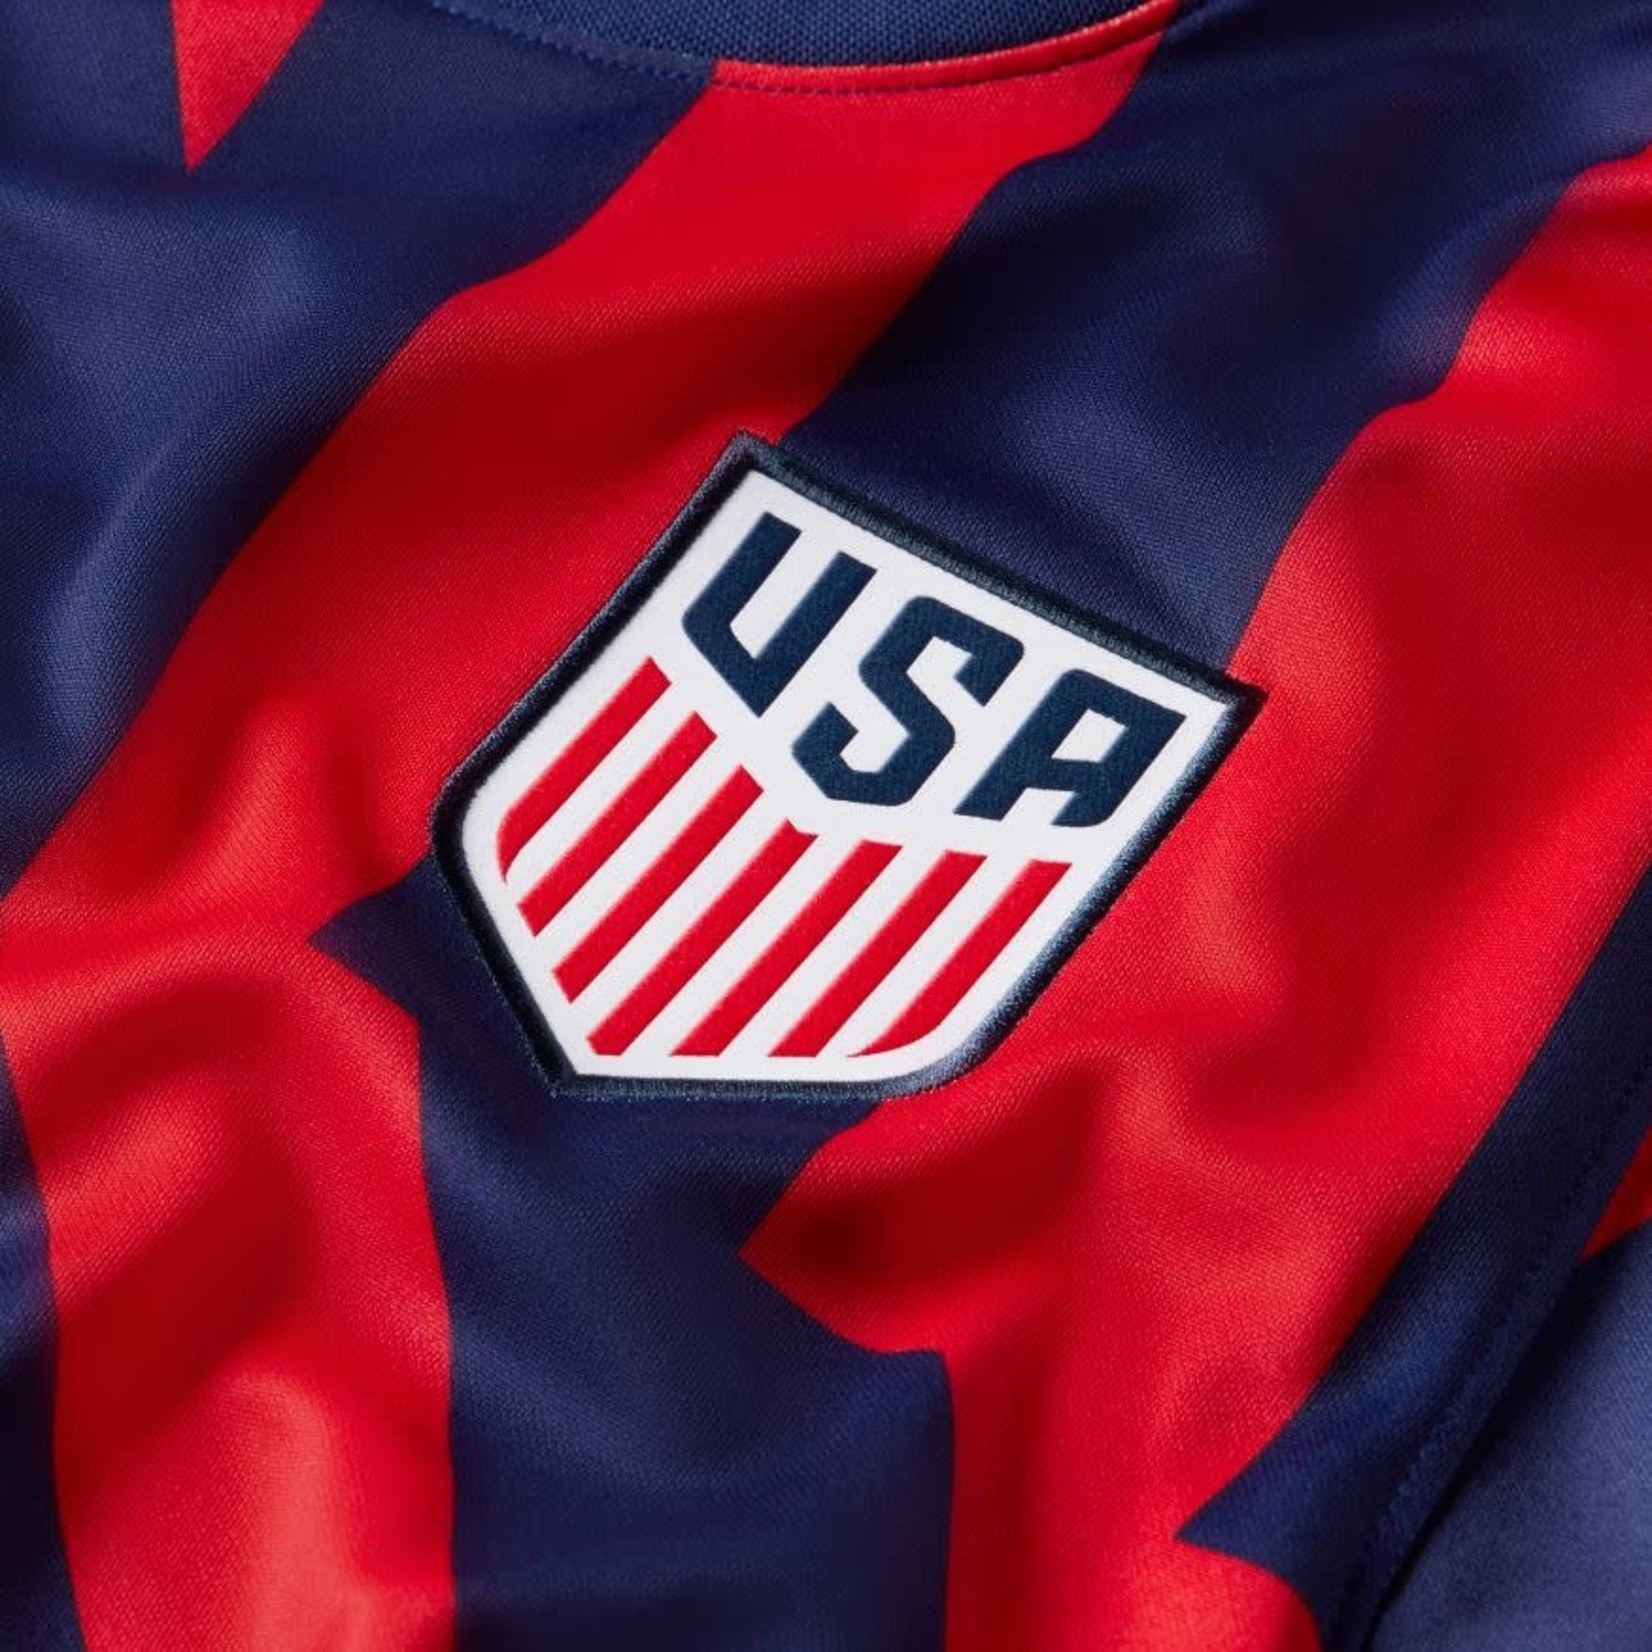 NIKE USA 2021 AWAY JERSEY (NAVY/RED)